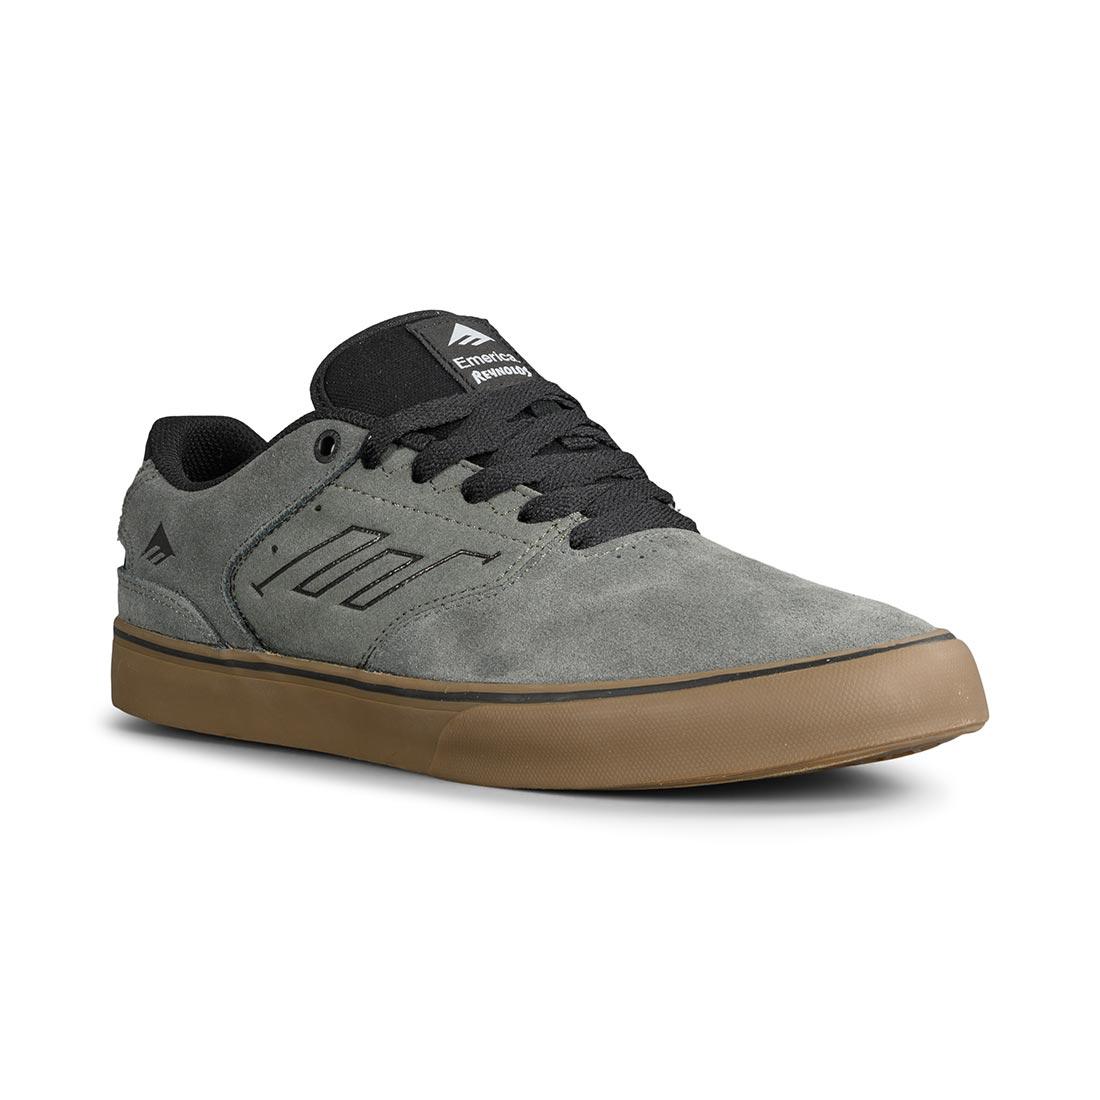 Emerica Reynolds Low Vulc Shoes - Grey